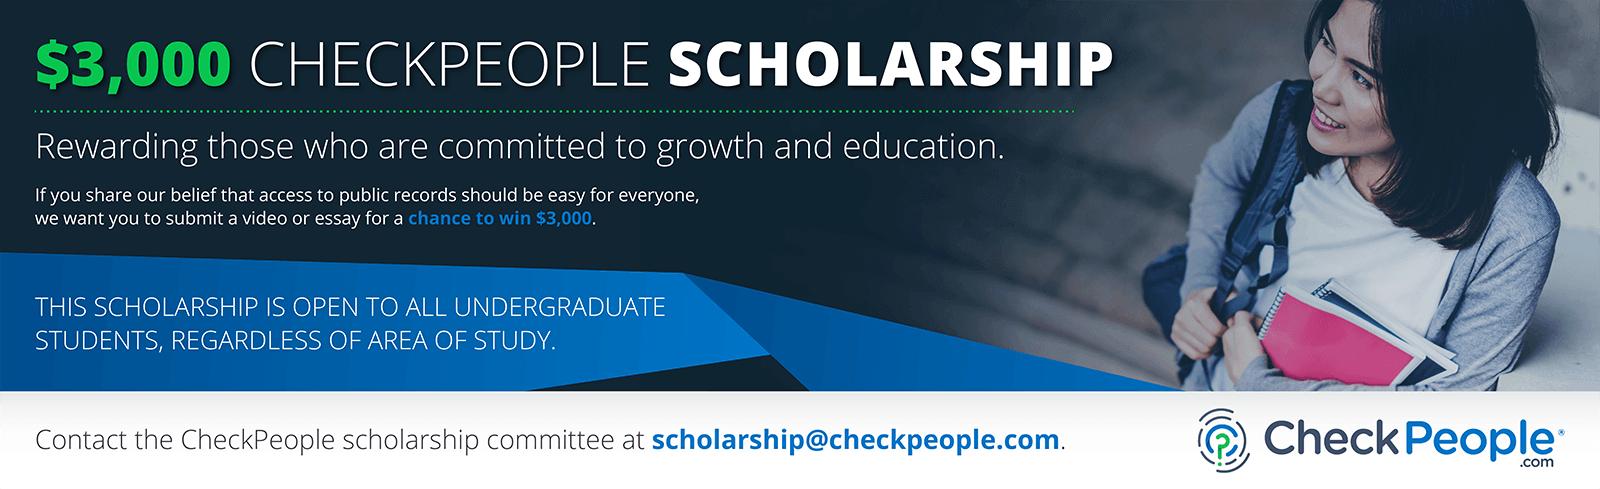 Scholarship Banner Image